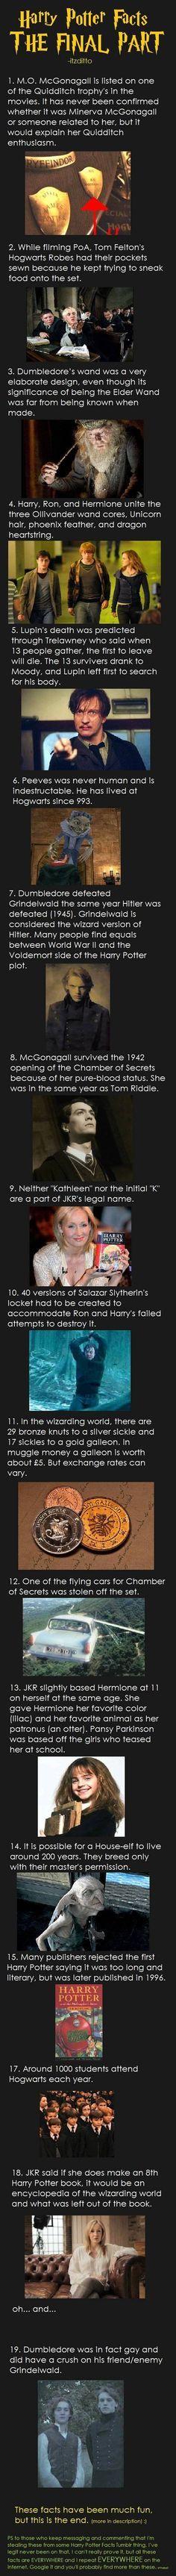 Harry Potter Facts 9 (The Final Part) - Imgur